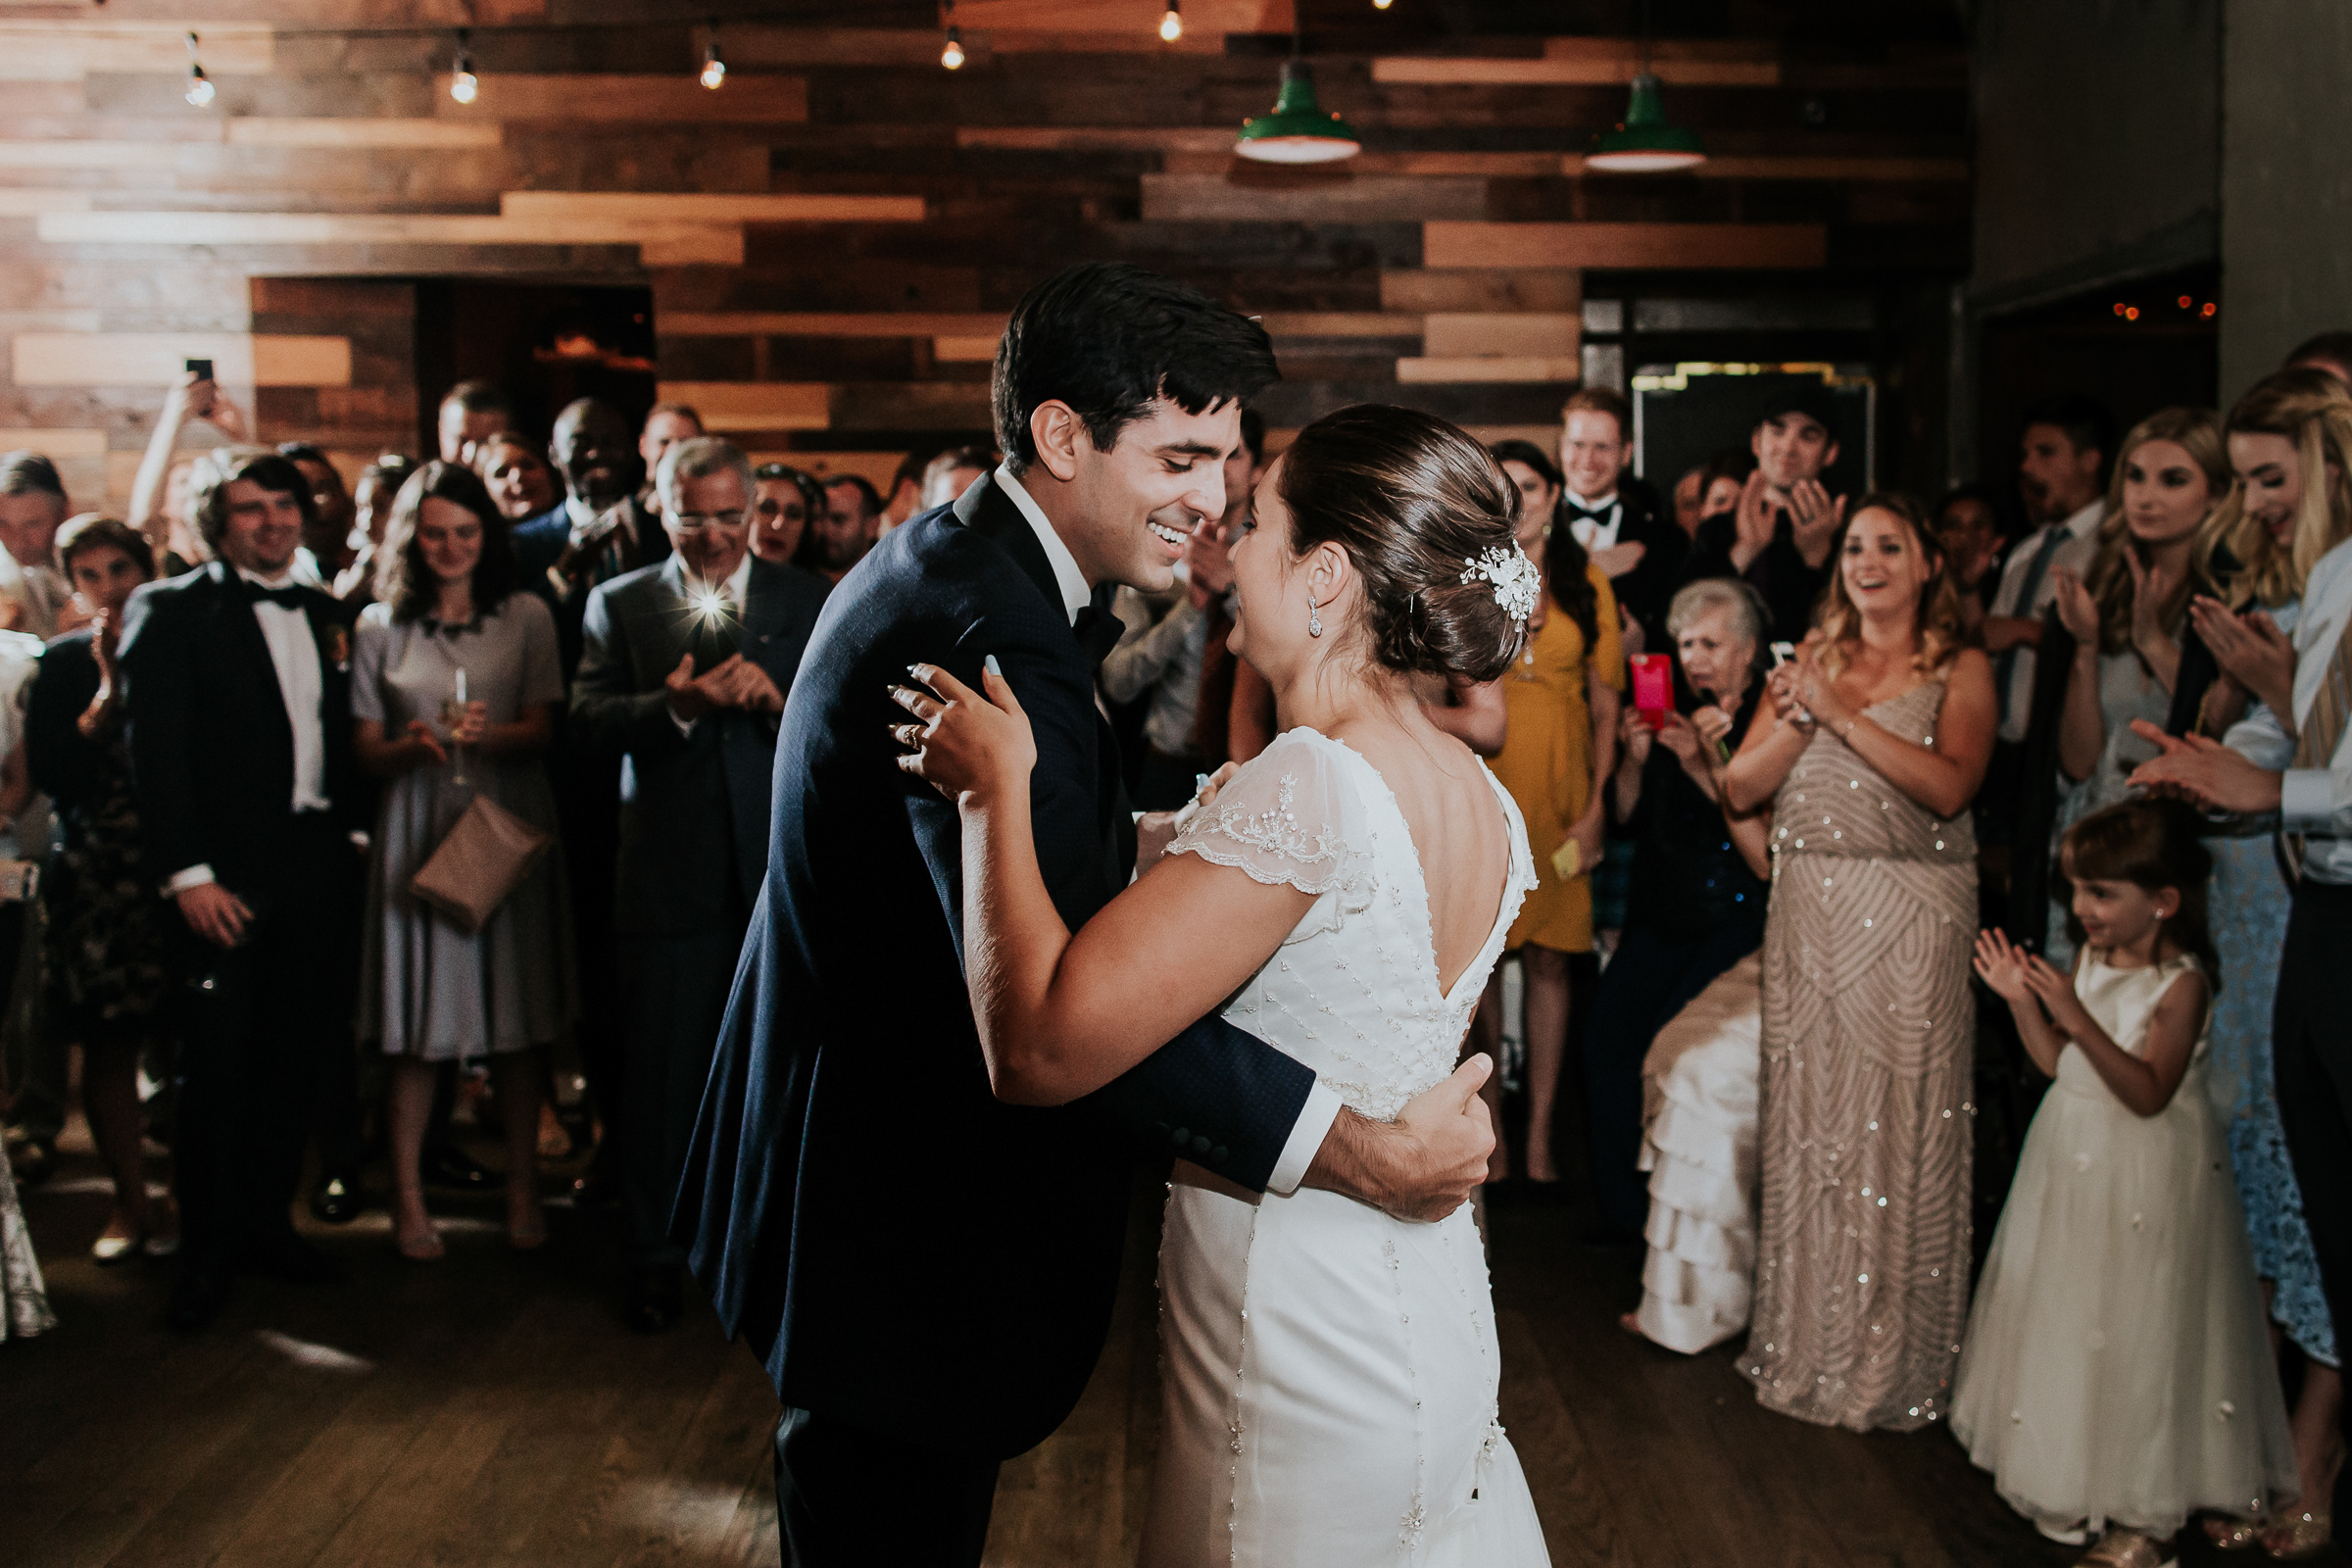 Brooklyn-Winery-NYC-Editorial-Documentary-Wedding-Photographer-Gina-Oli-102.jpg